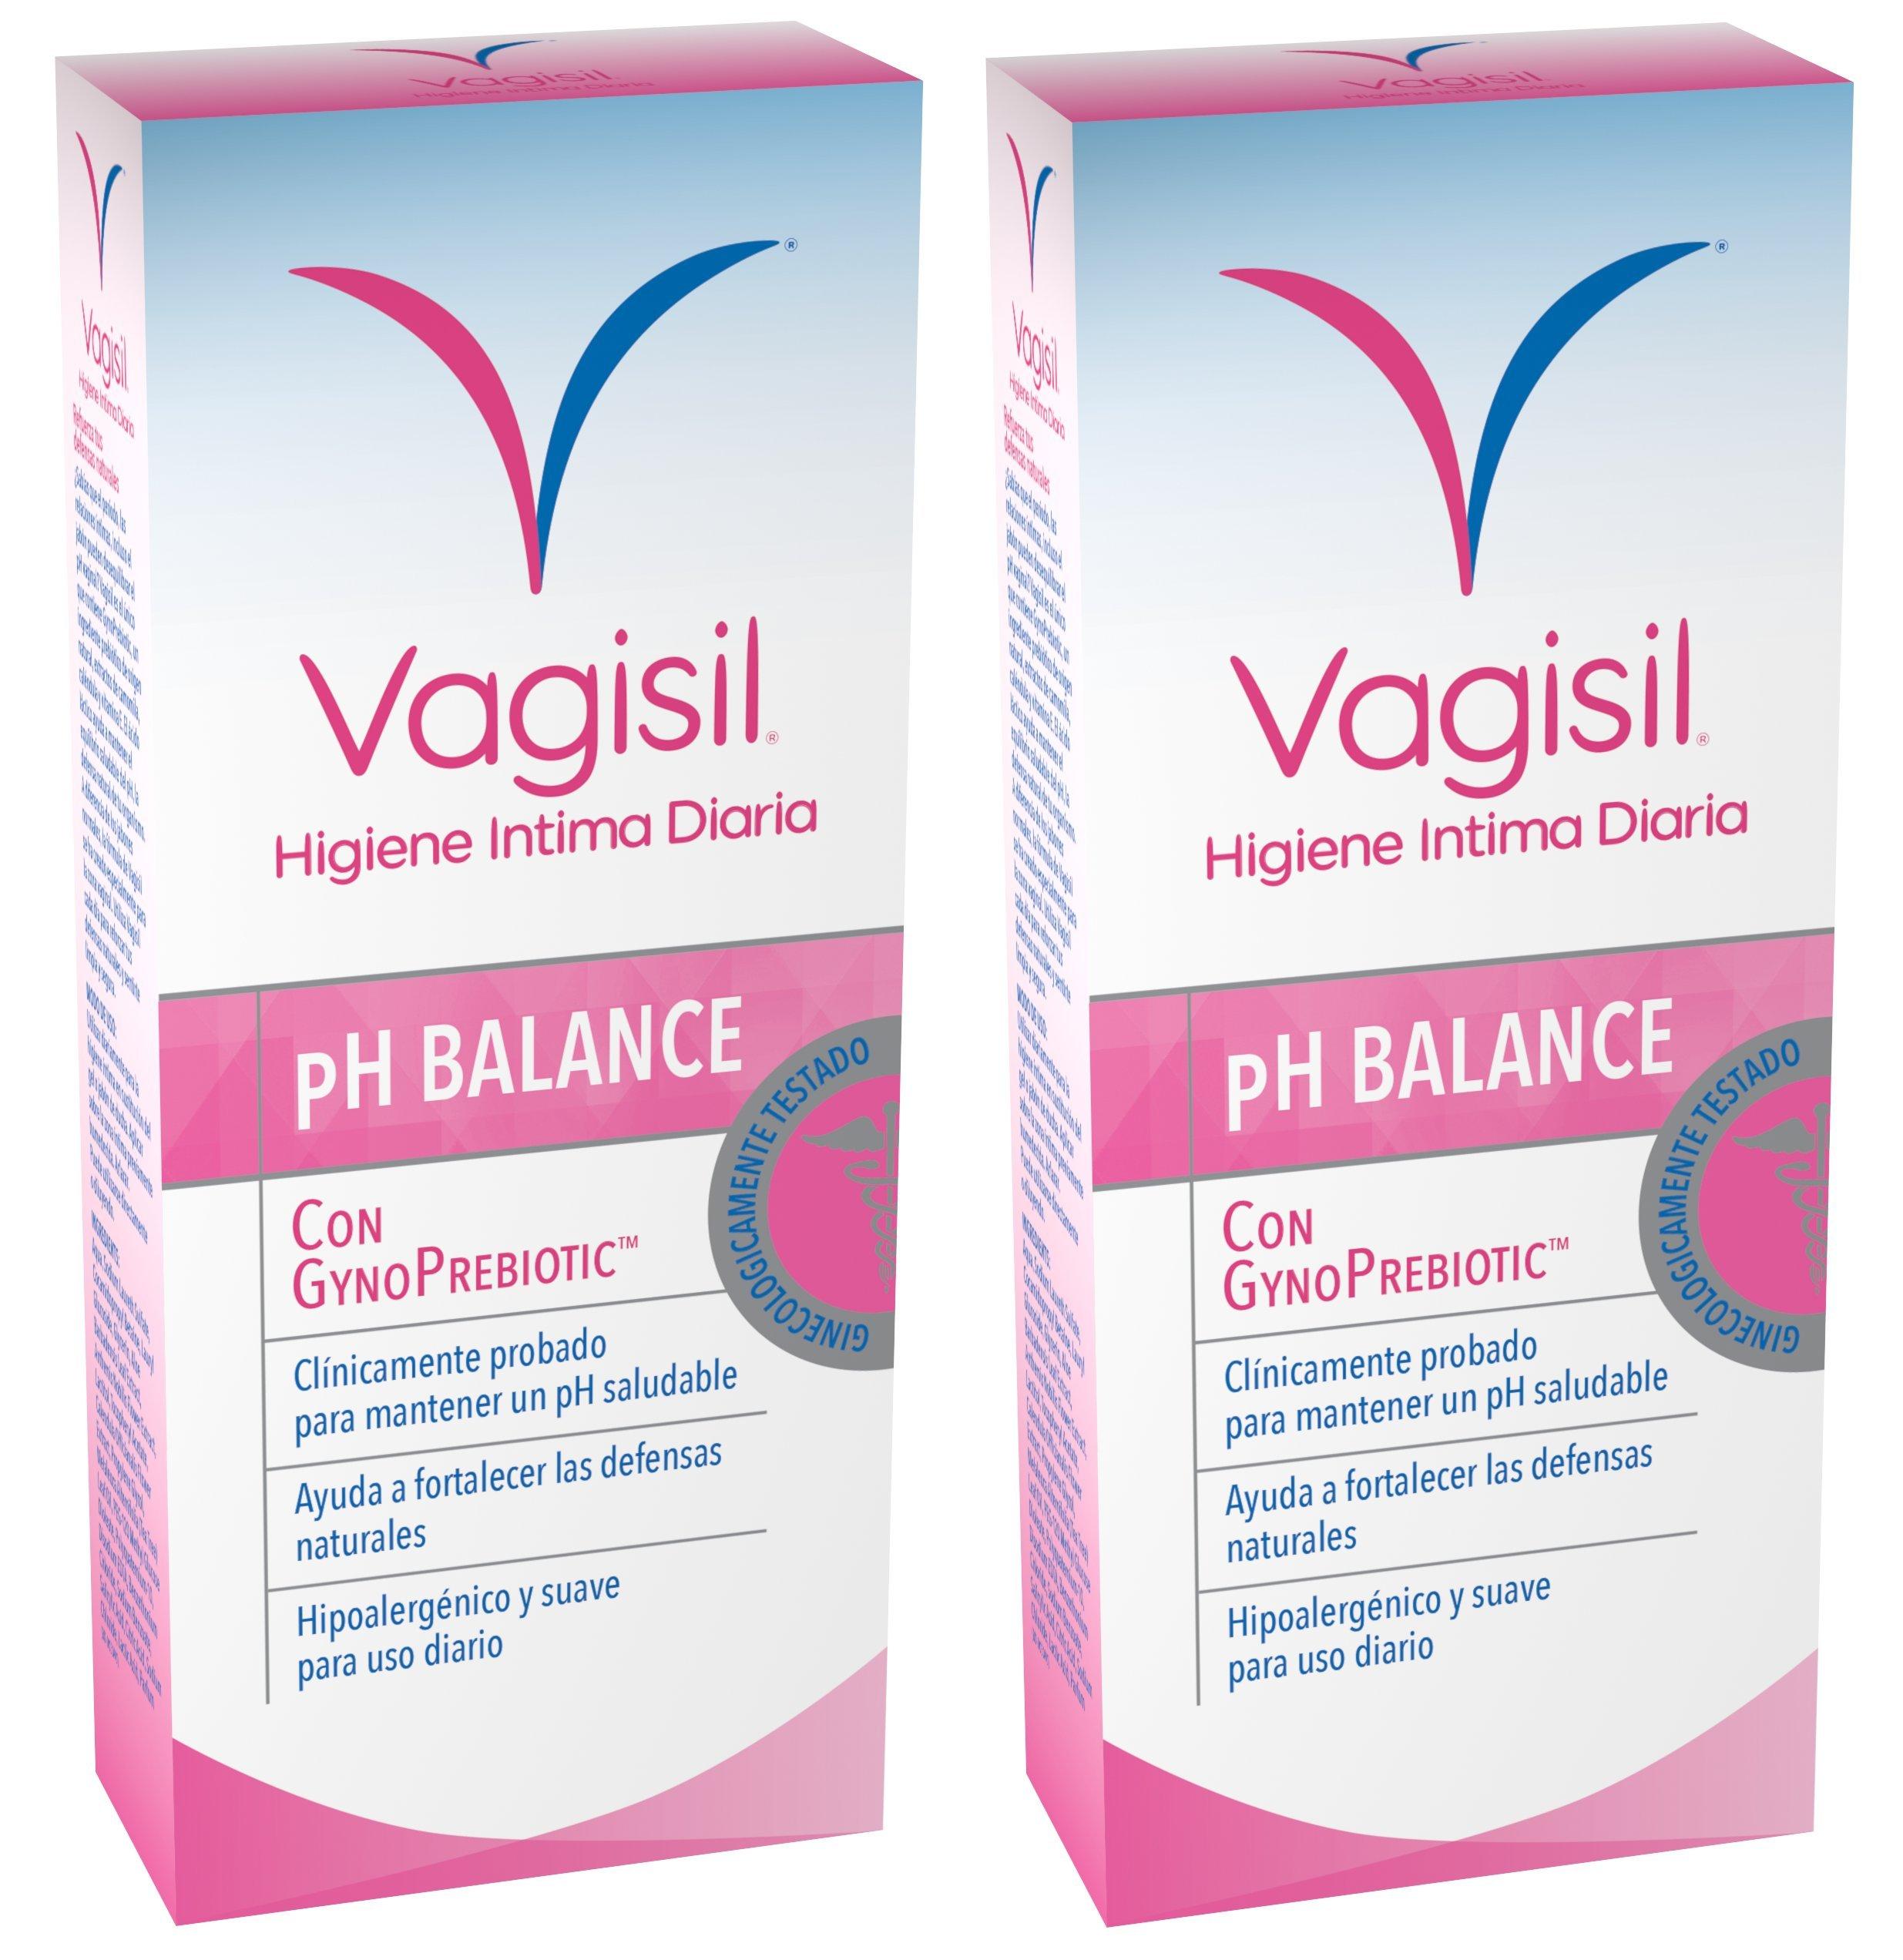 VAGISIL Higiene intima prebiotico - pack de 2 x 250ml - Total 500ml product image